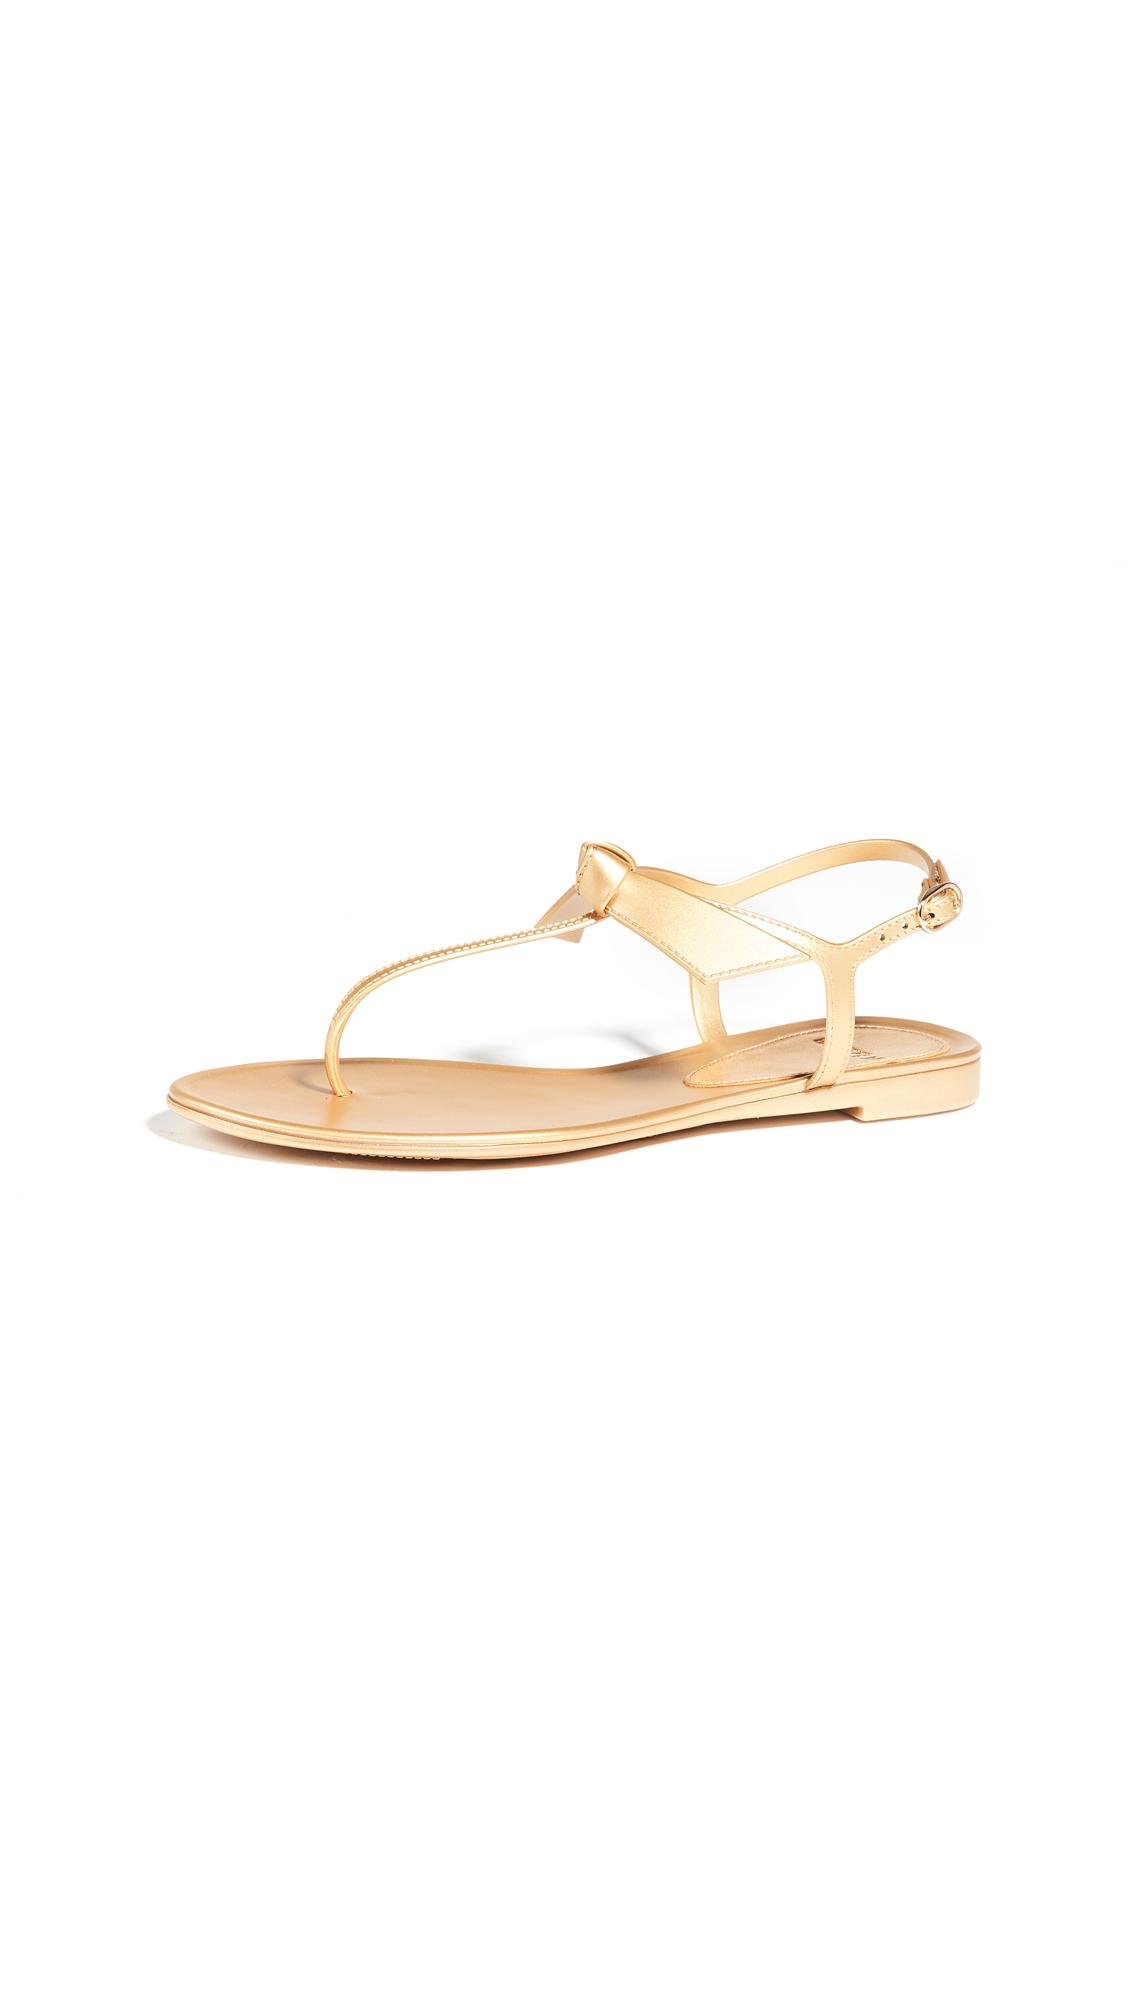 Buy Alexandre Birman Clarita Jelly Metallic Sandals online, shop Alexandre Birman